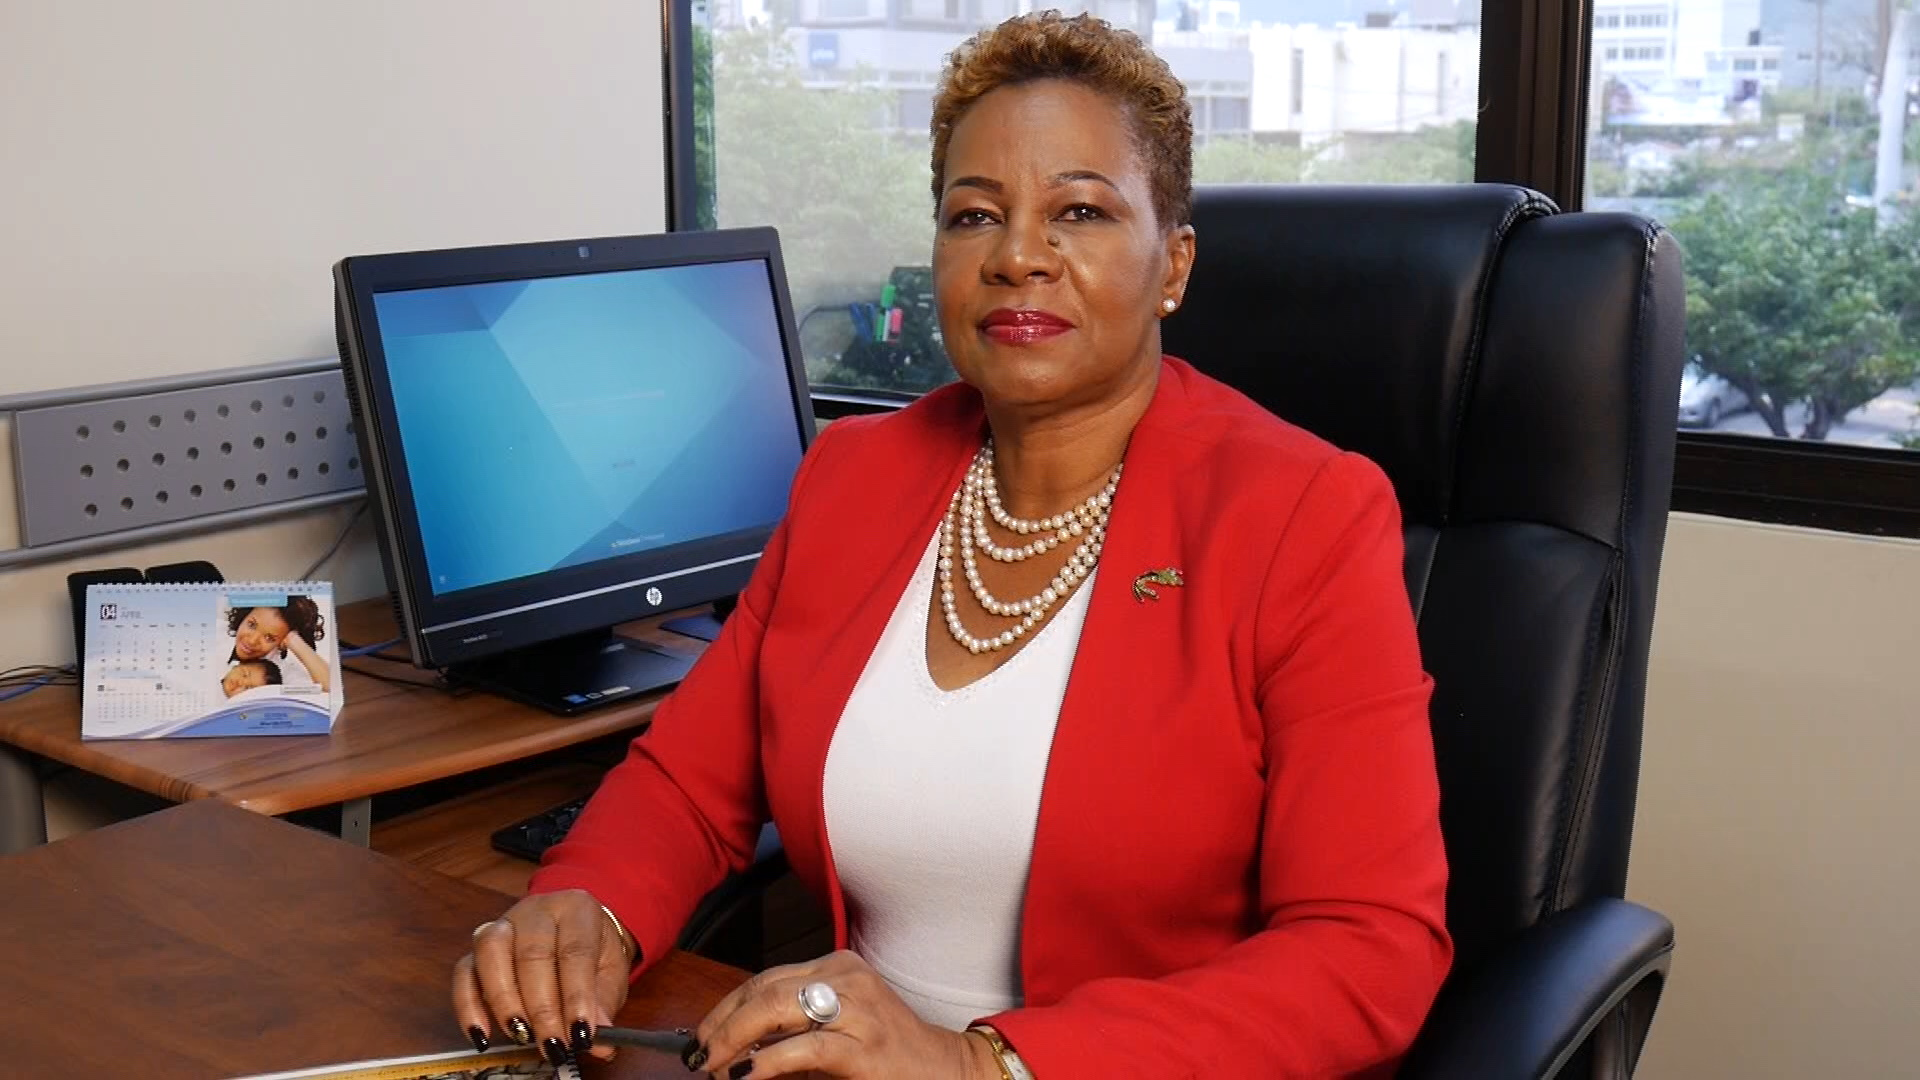 MoEYI welcomes new Acting Permanent Secretary, Mrs. Maureen Dwyer